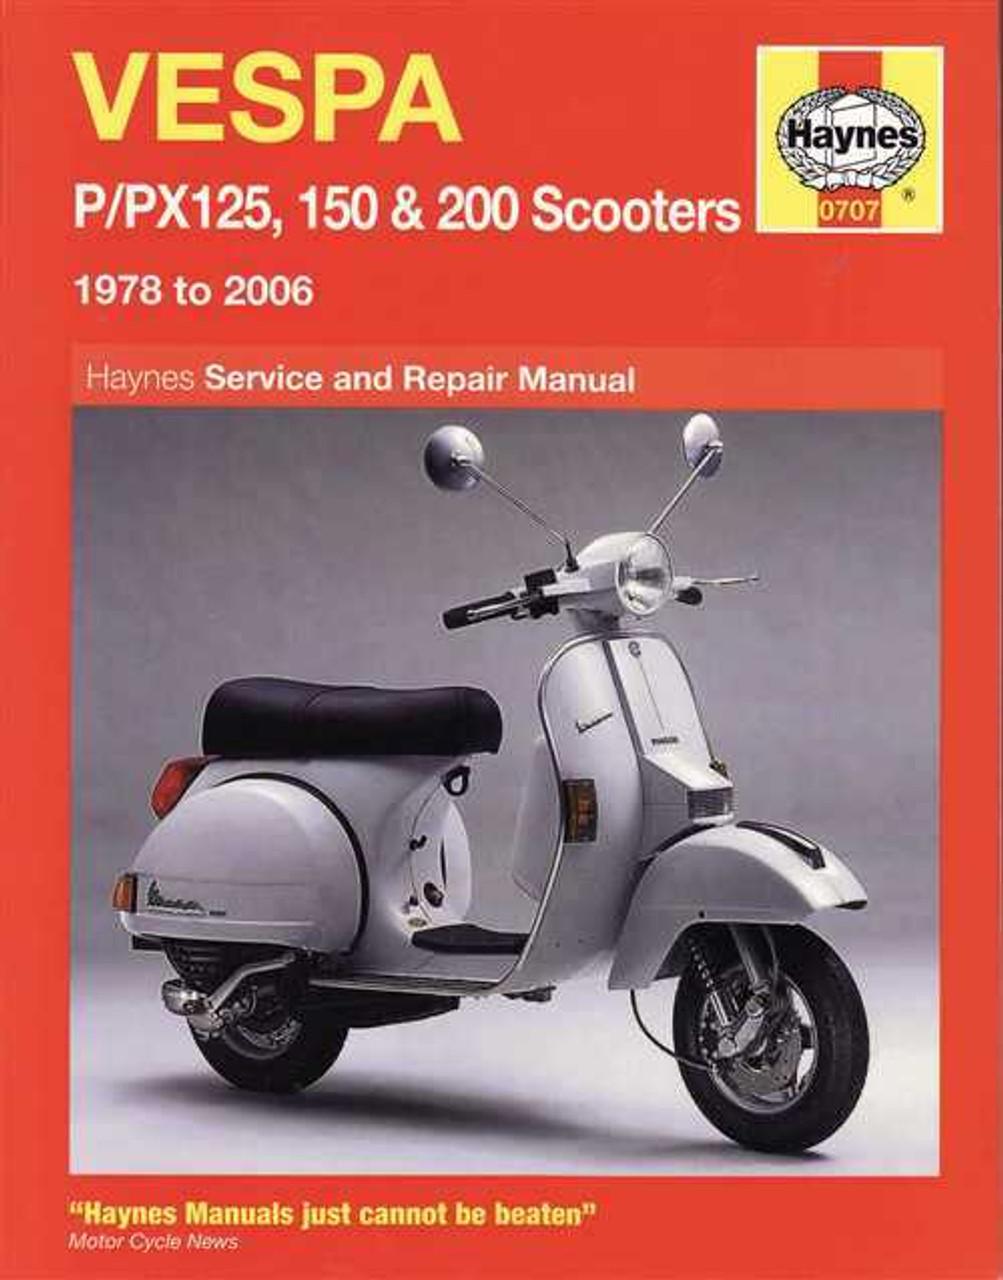 vespa p px125 150 amp 200 scooters 1978 2006 workshop manual rh automotobookshop com au vespa workshop manual vespa workshop manual